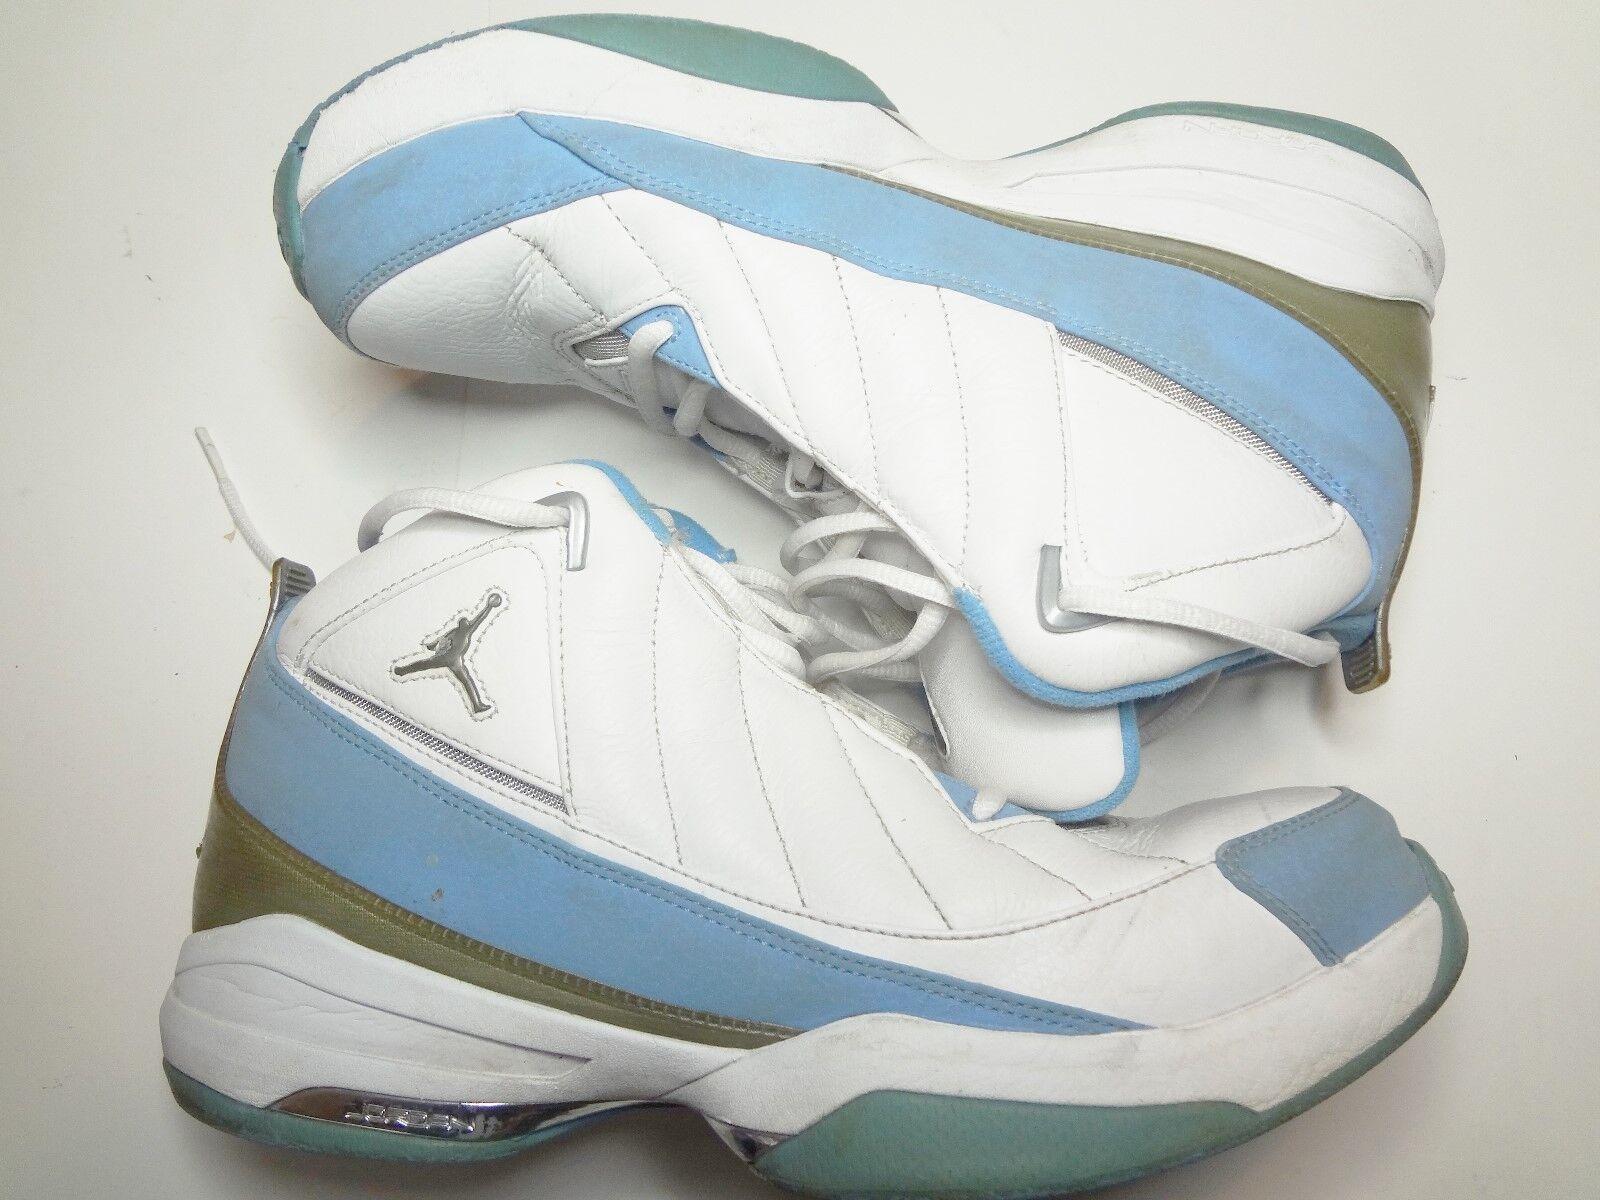 timeless design 8f654 725fd Nike Air Jordan Game Mens Sz 11.5 Style 315135104 Pure Vintage  nenhos2306-Men s Athletic Shoes